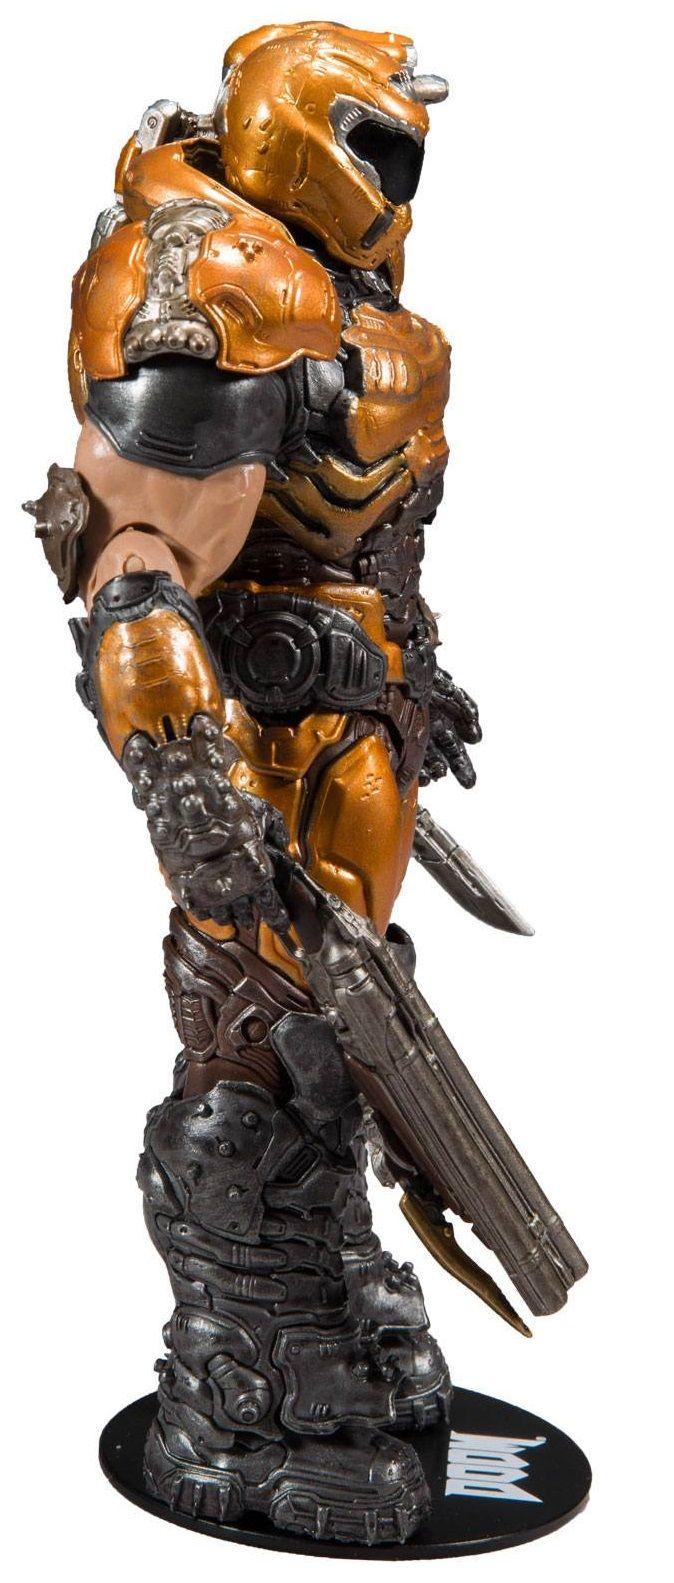 Екшън Фигура McFarlane Doom Eternal - Doom Slayer Phobos, 18 cm - 3